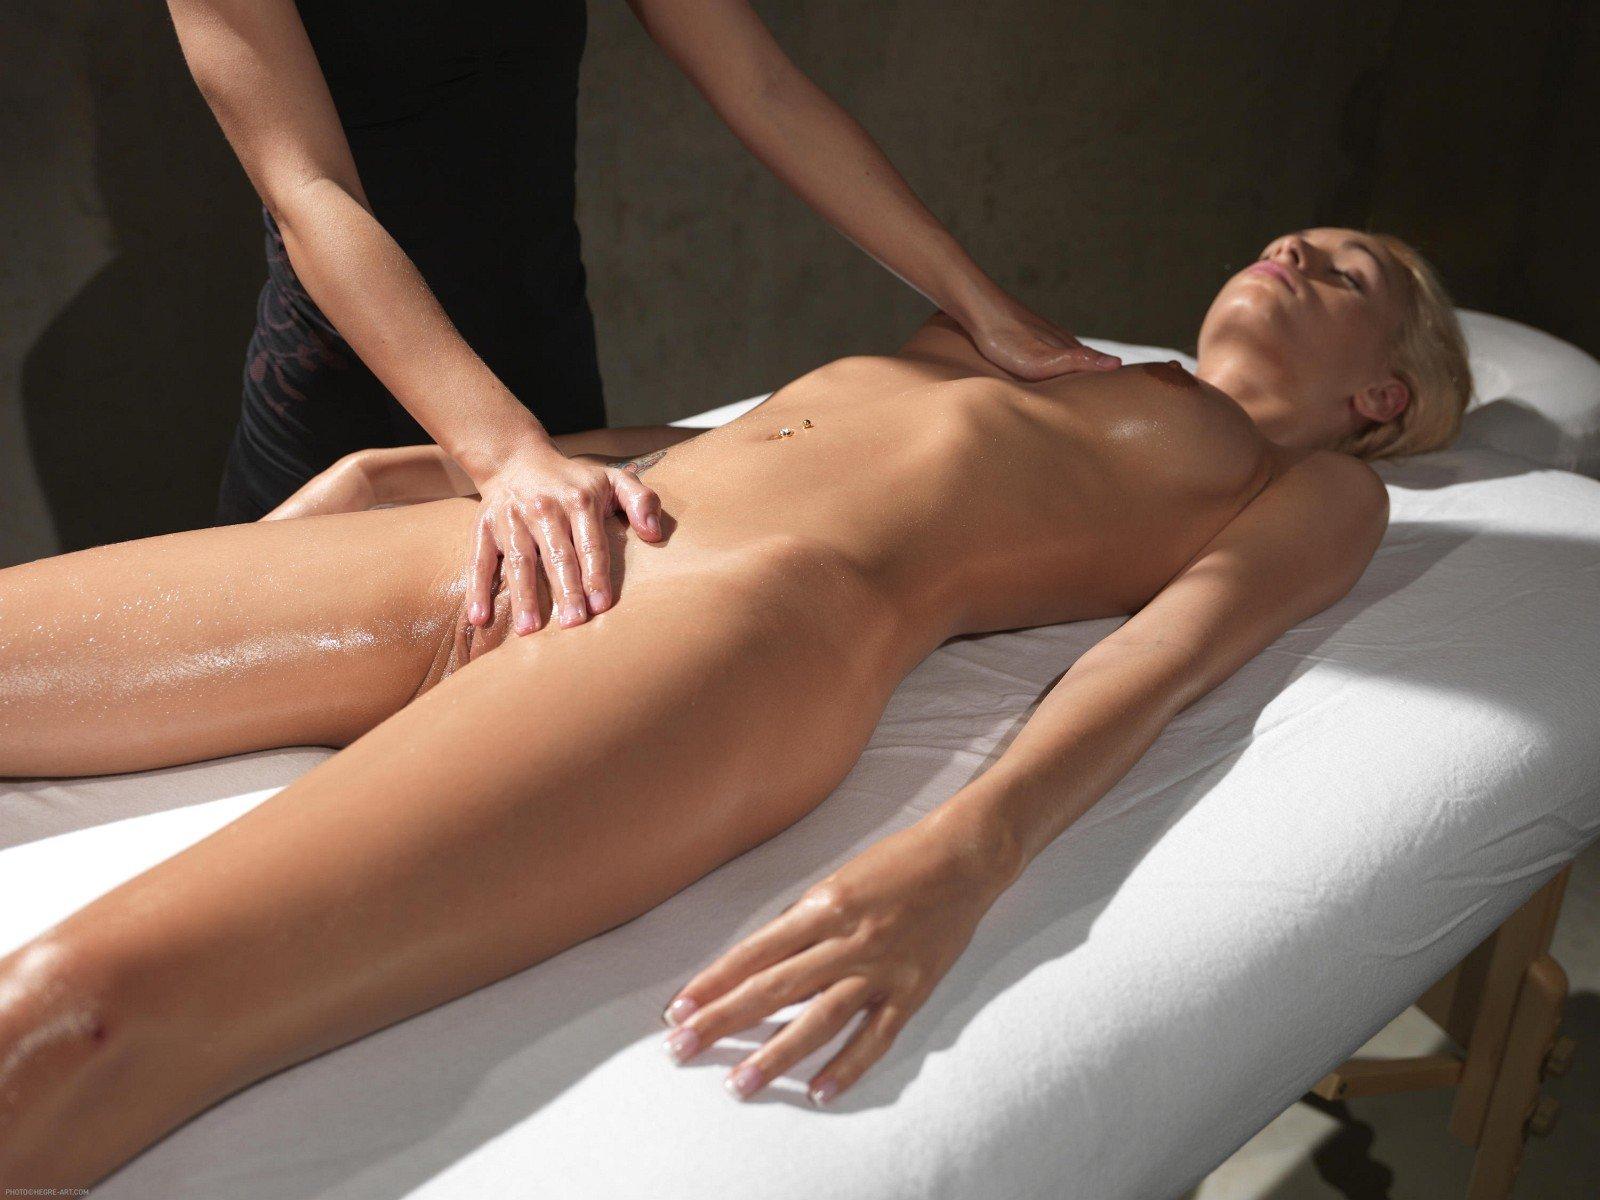 The art of sensual full body relaxing erotic massage